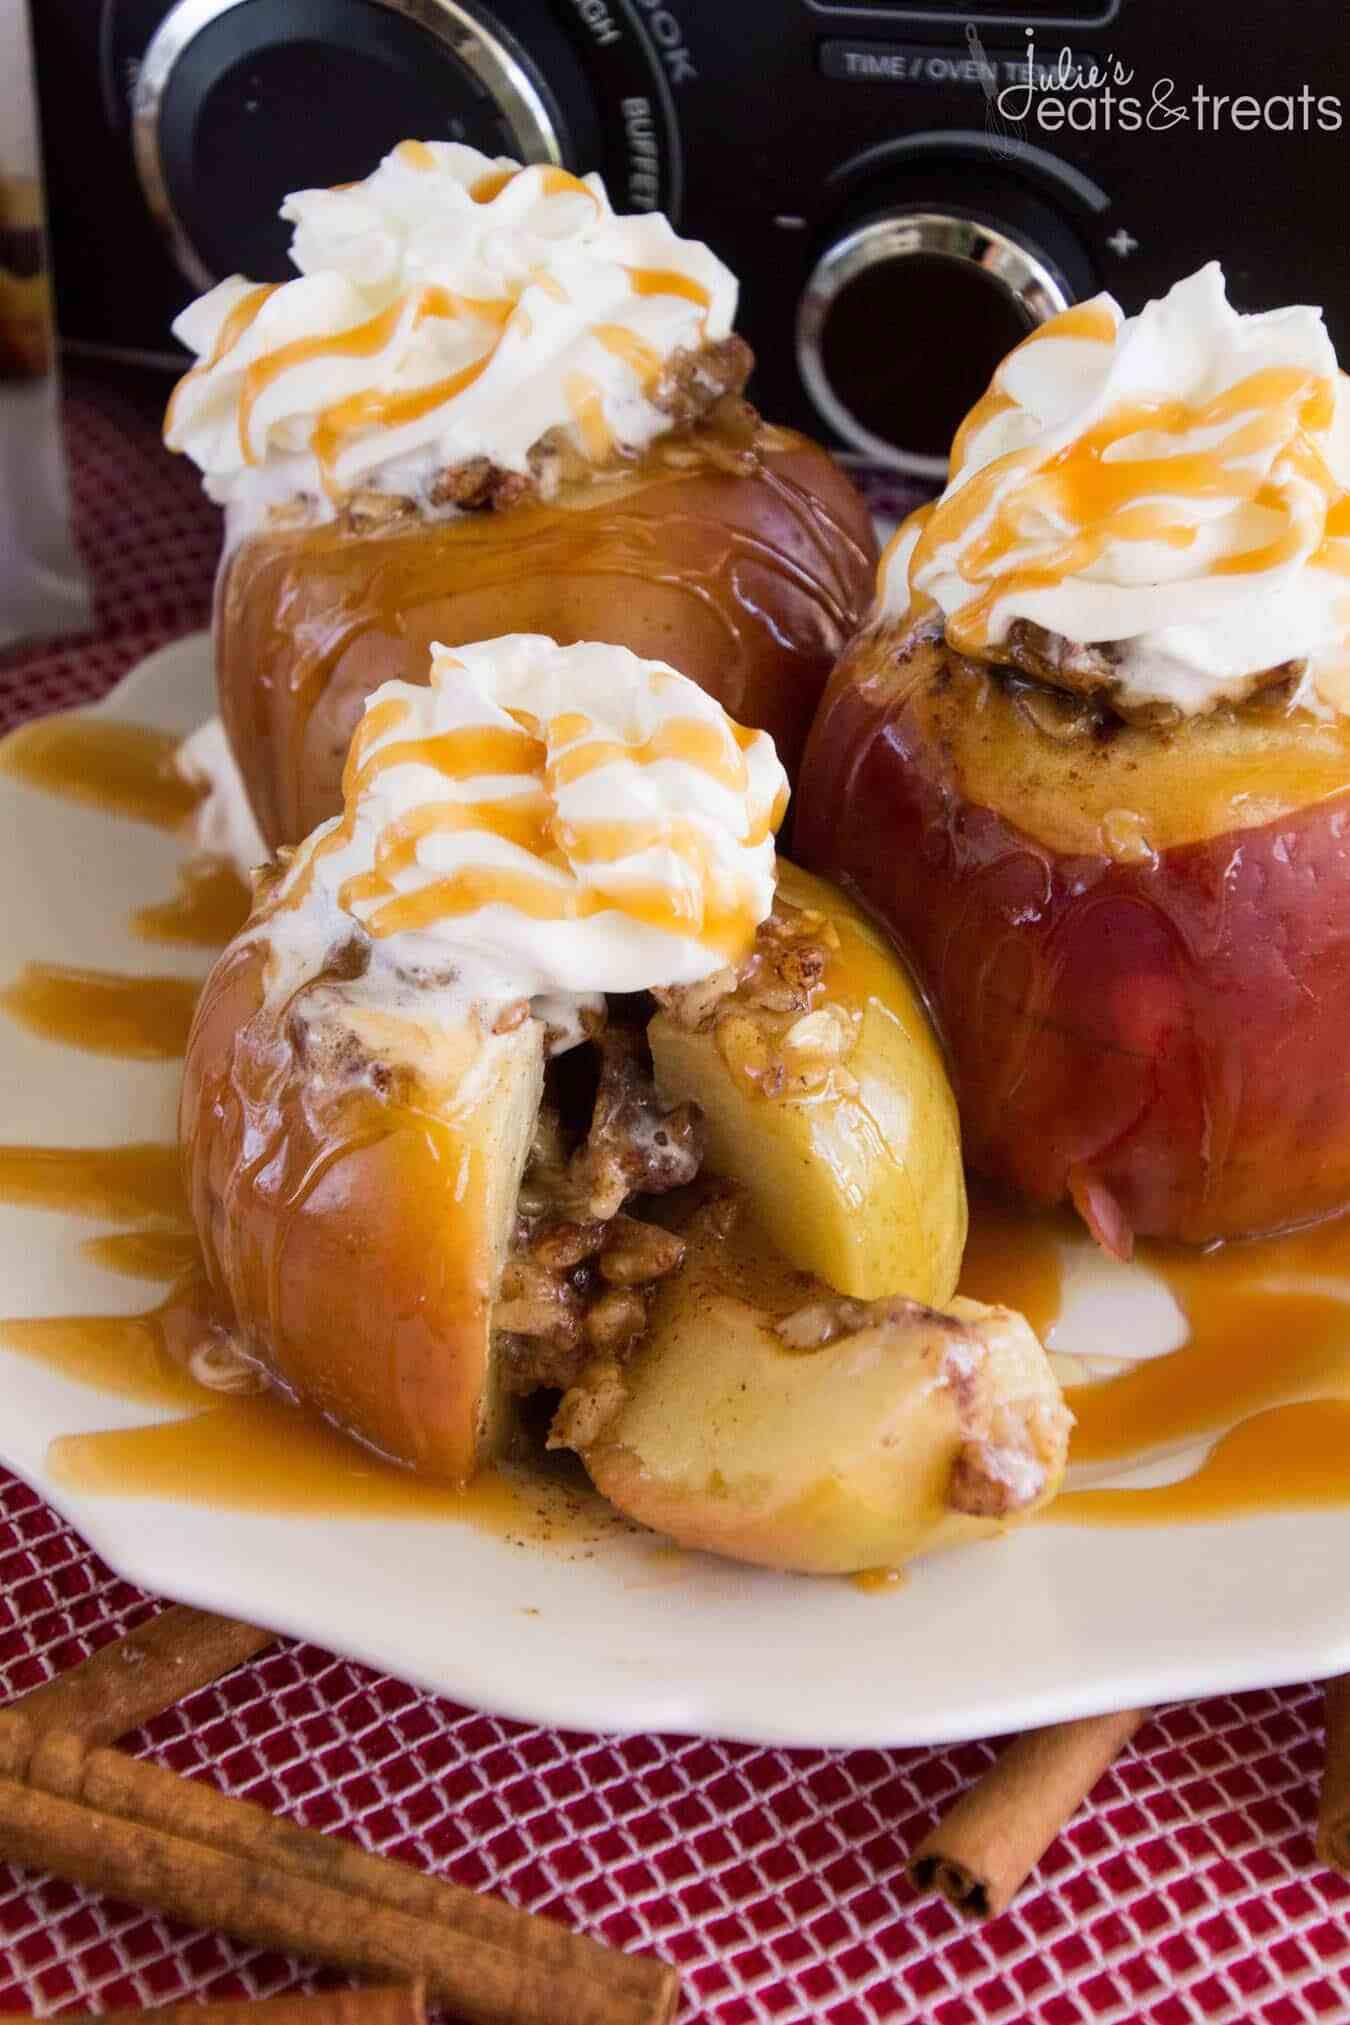 Slow Cooker Baked Apples | Slow Cooker Desserts Recipes